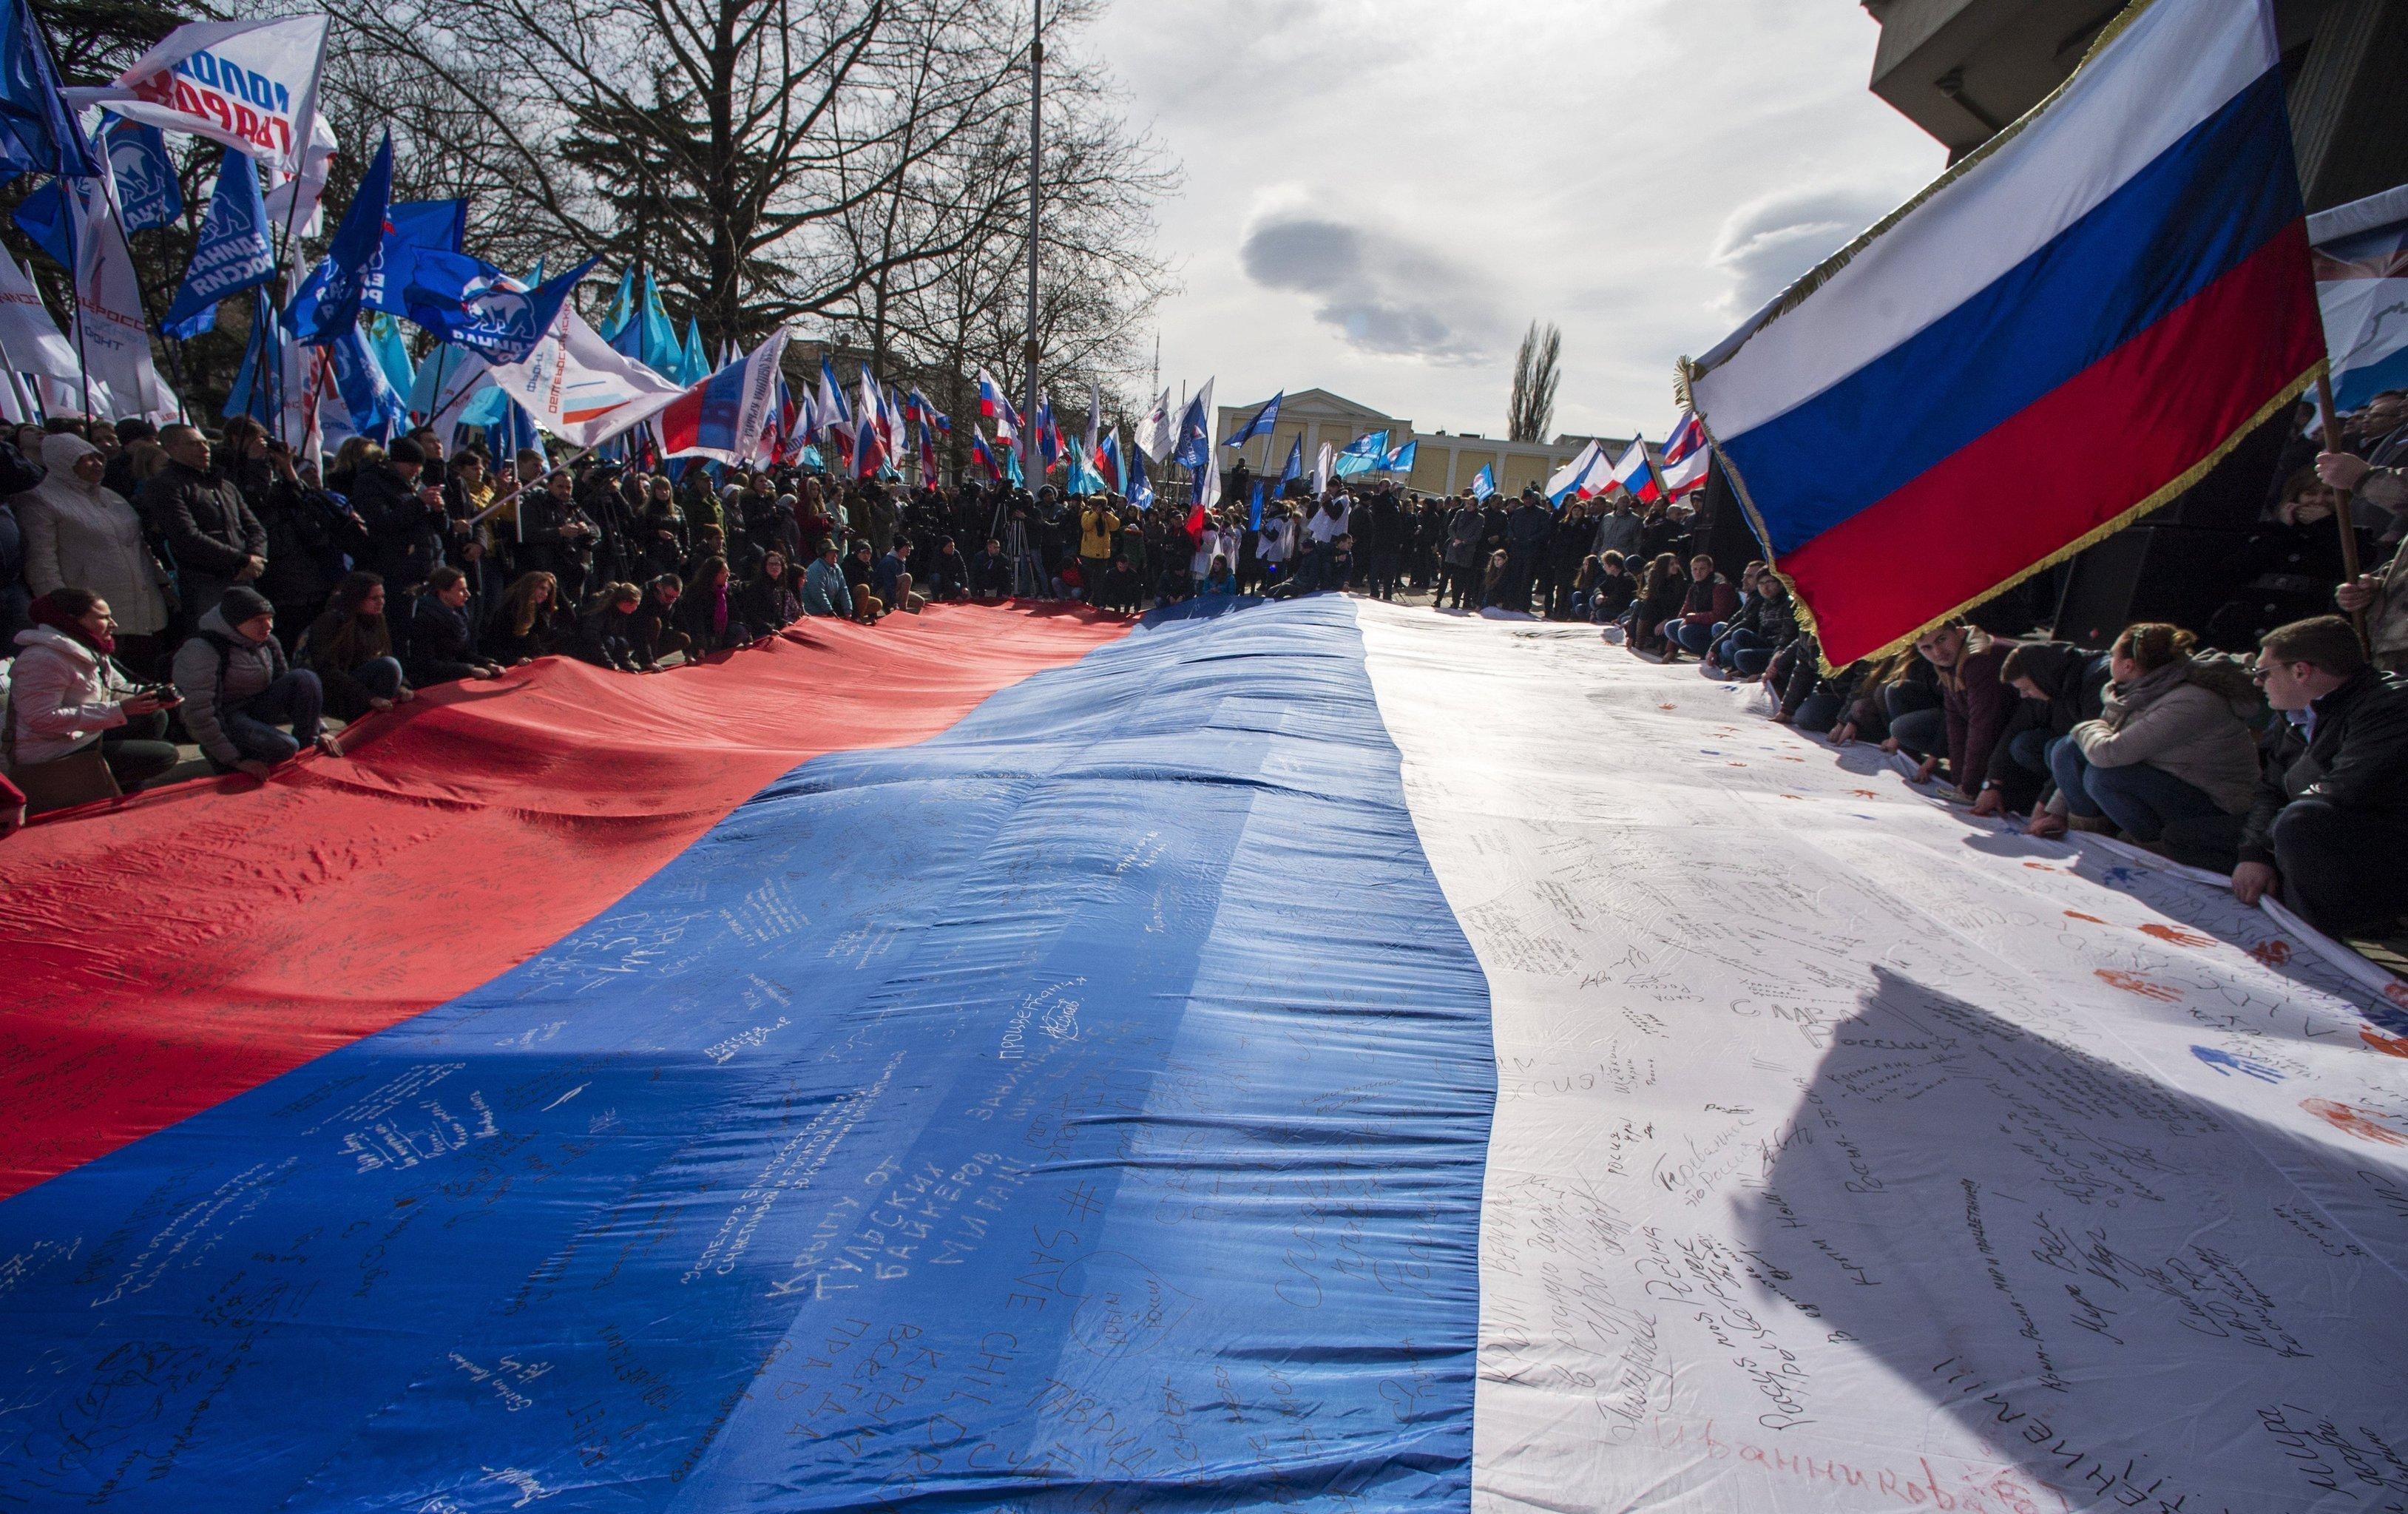 Celebrating Crimean Spring's first anniversary in Simferopol